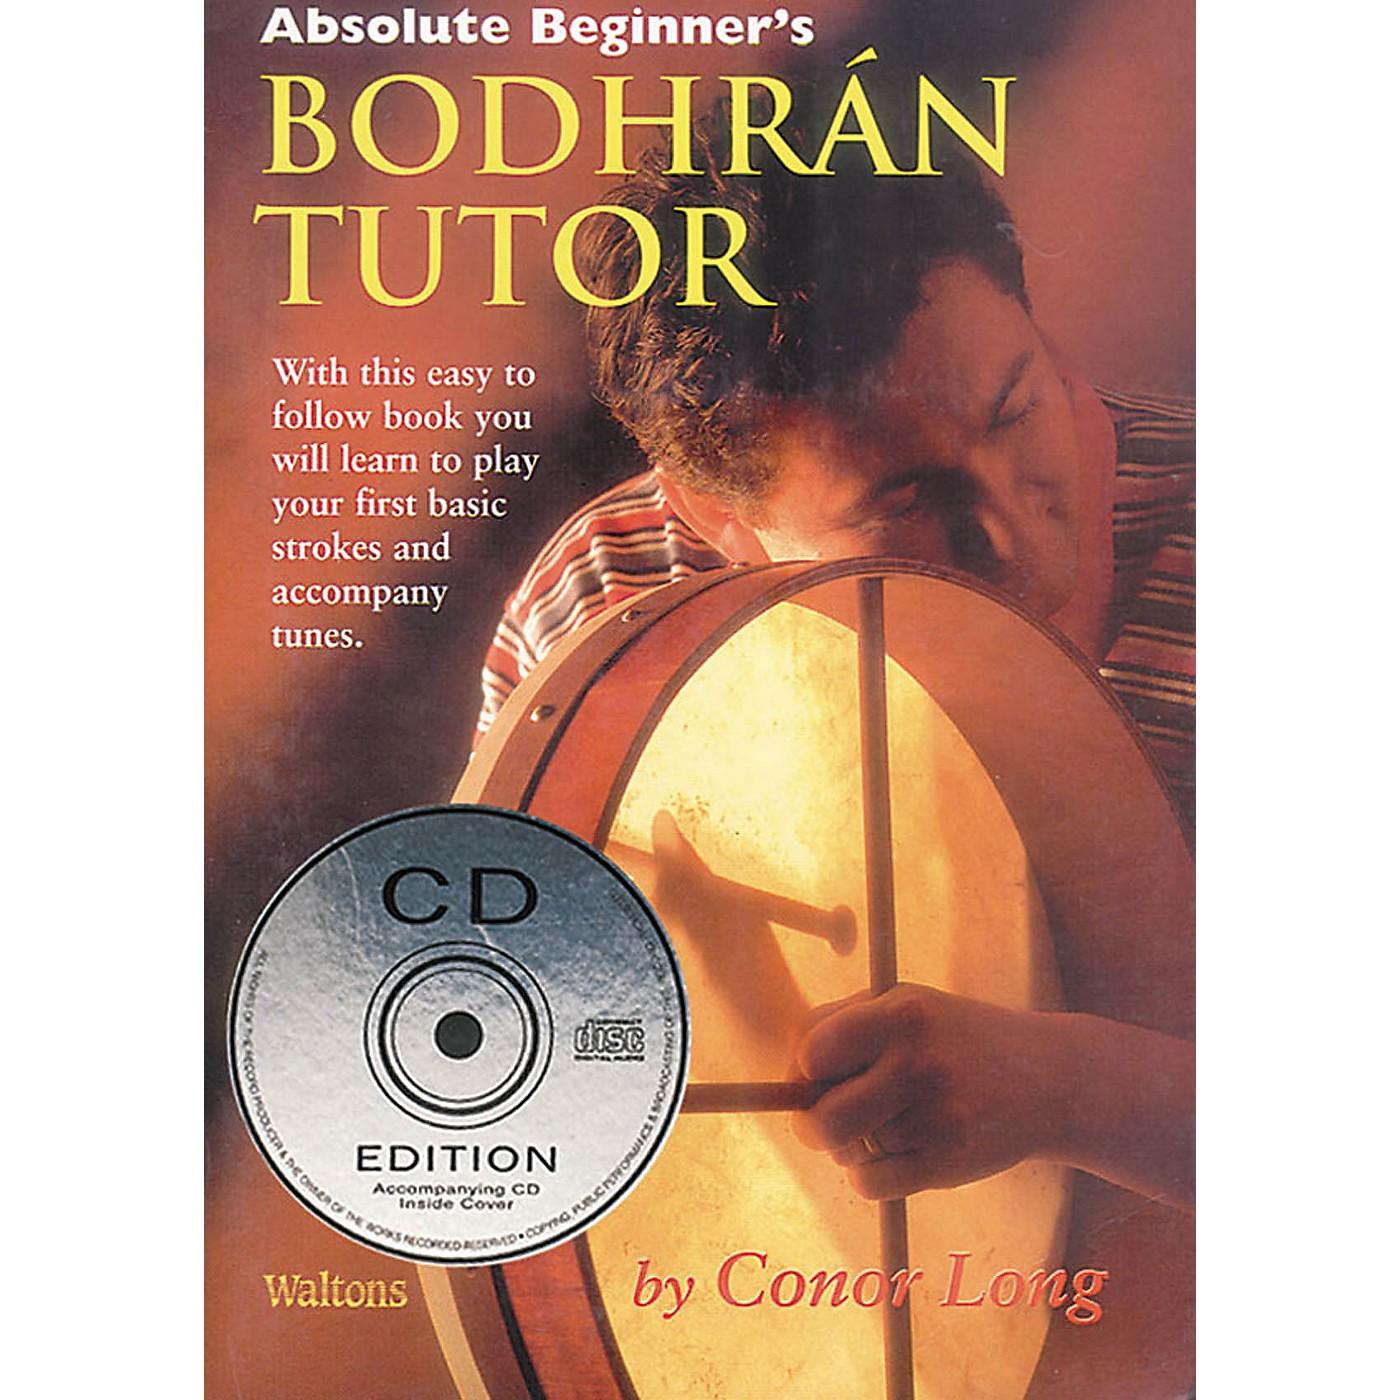 Waltons Absolute Beginner's Bodhrán Tutor Waltons Irish Music Books Series Written by Conor Long thumbnail